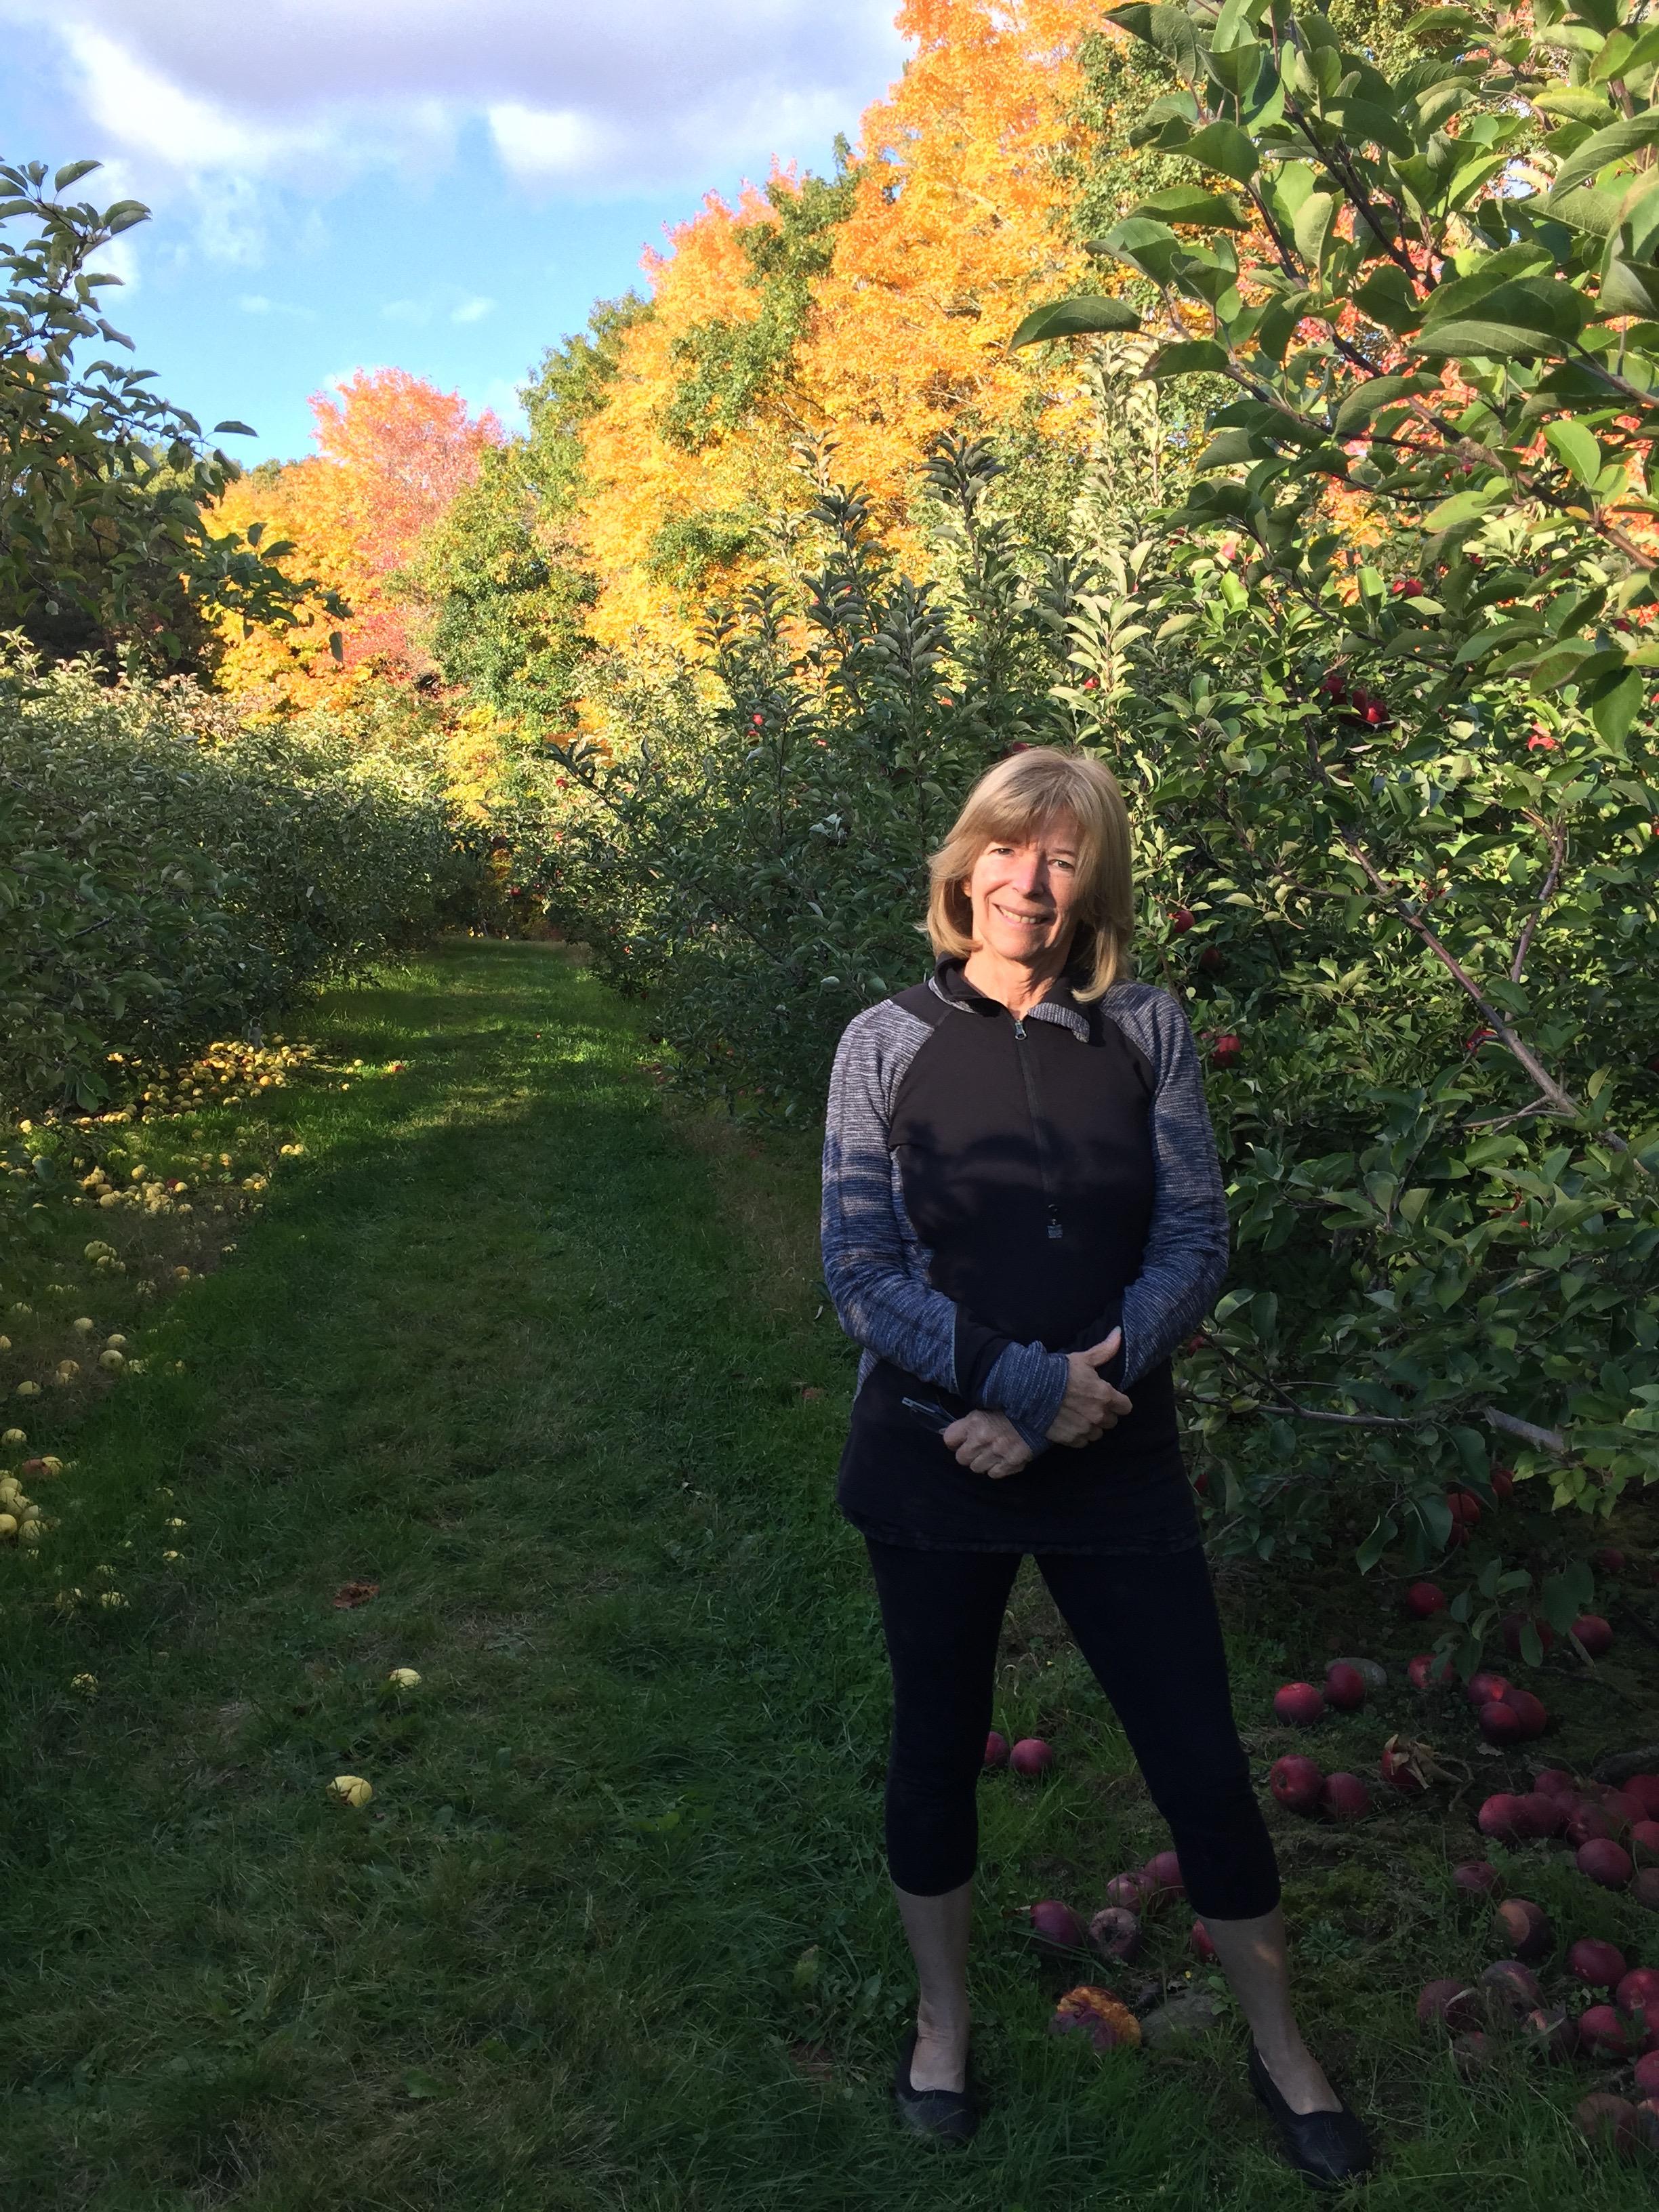 Enjoying a beautiful fall day at an apple orchard